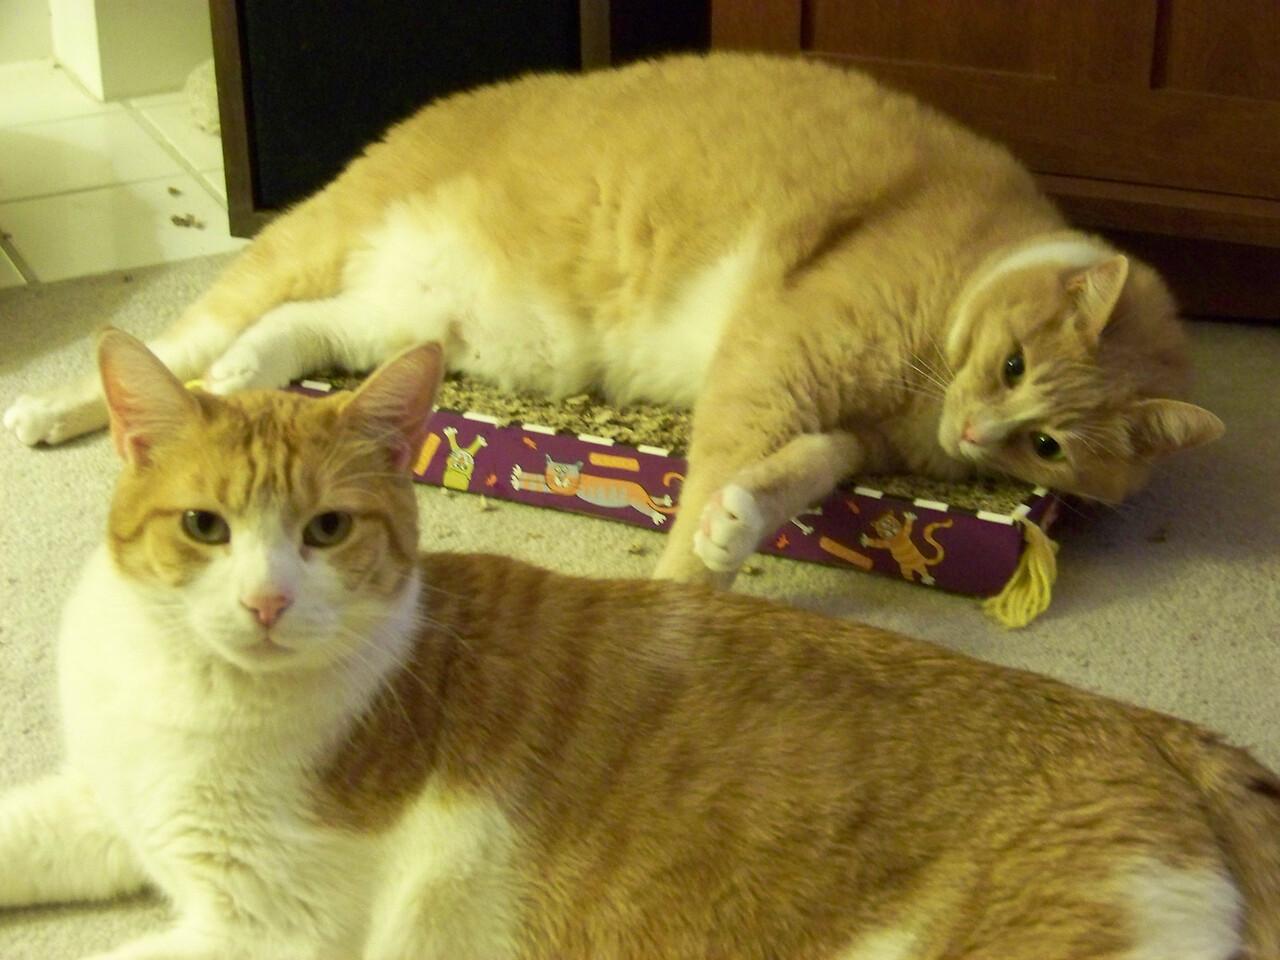 Stan & Ollie (no flash).  October 2009.